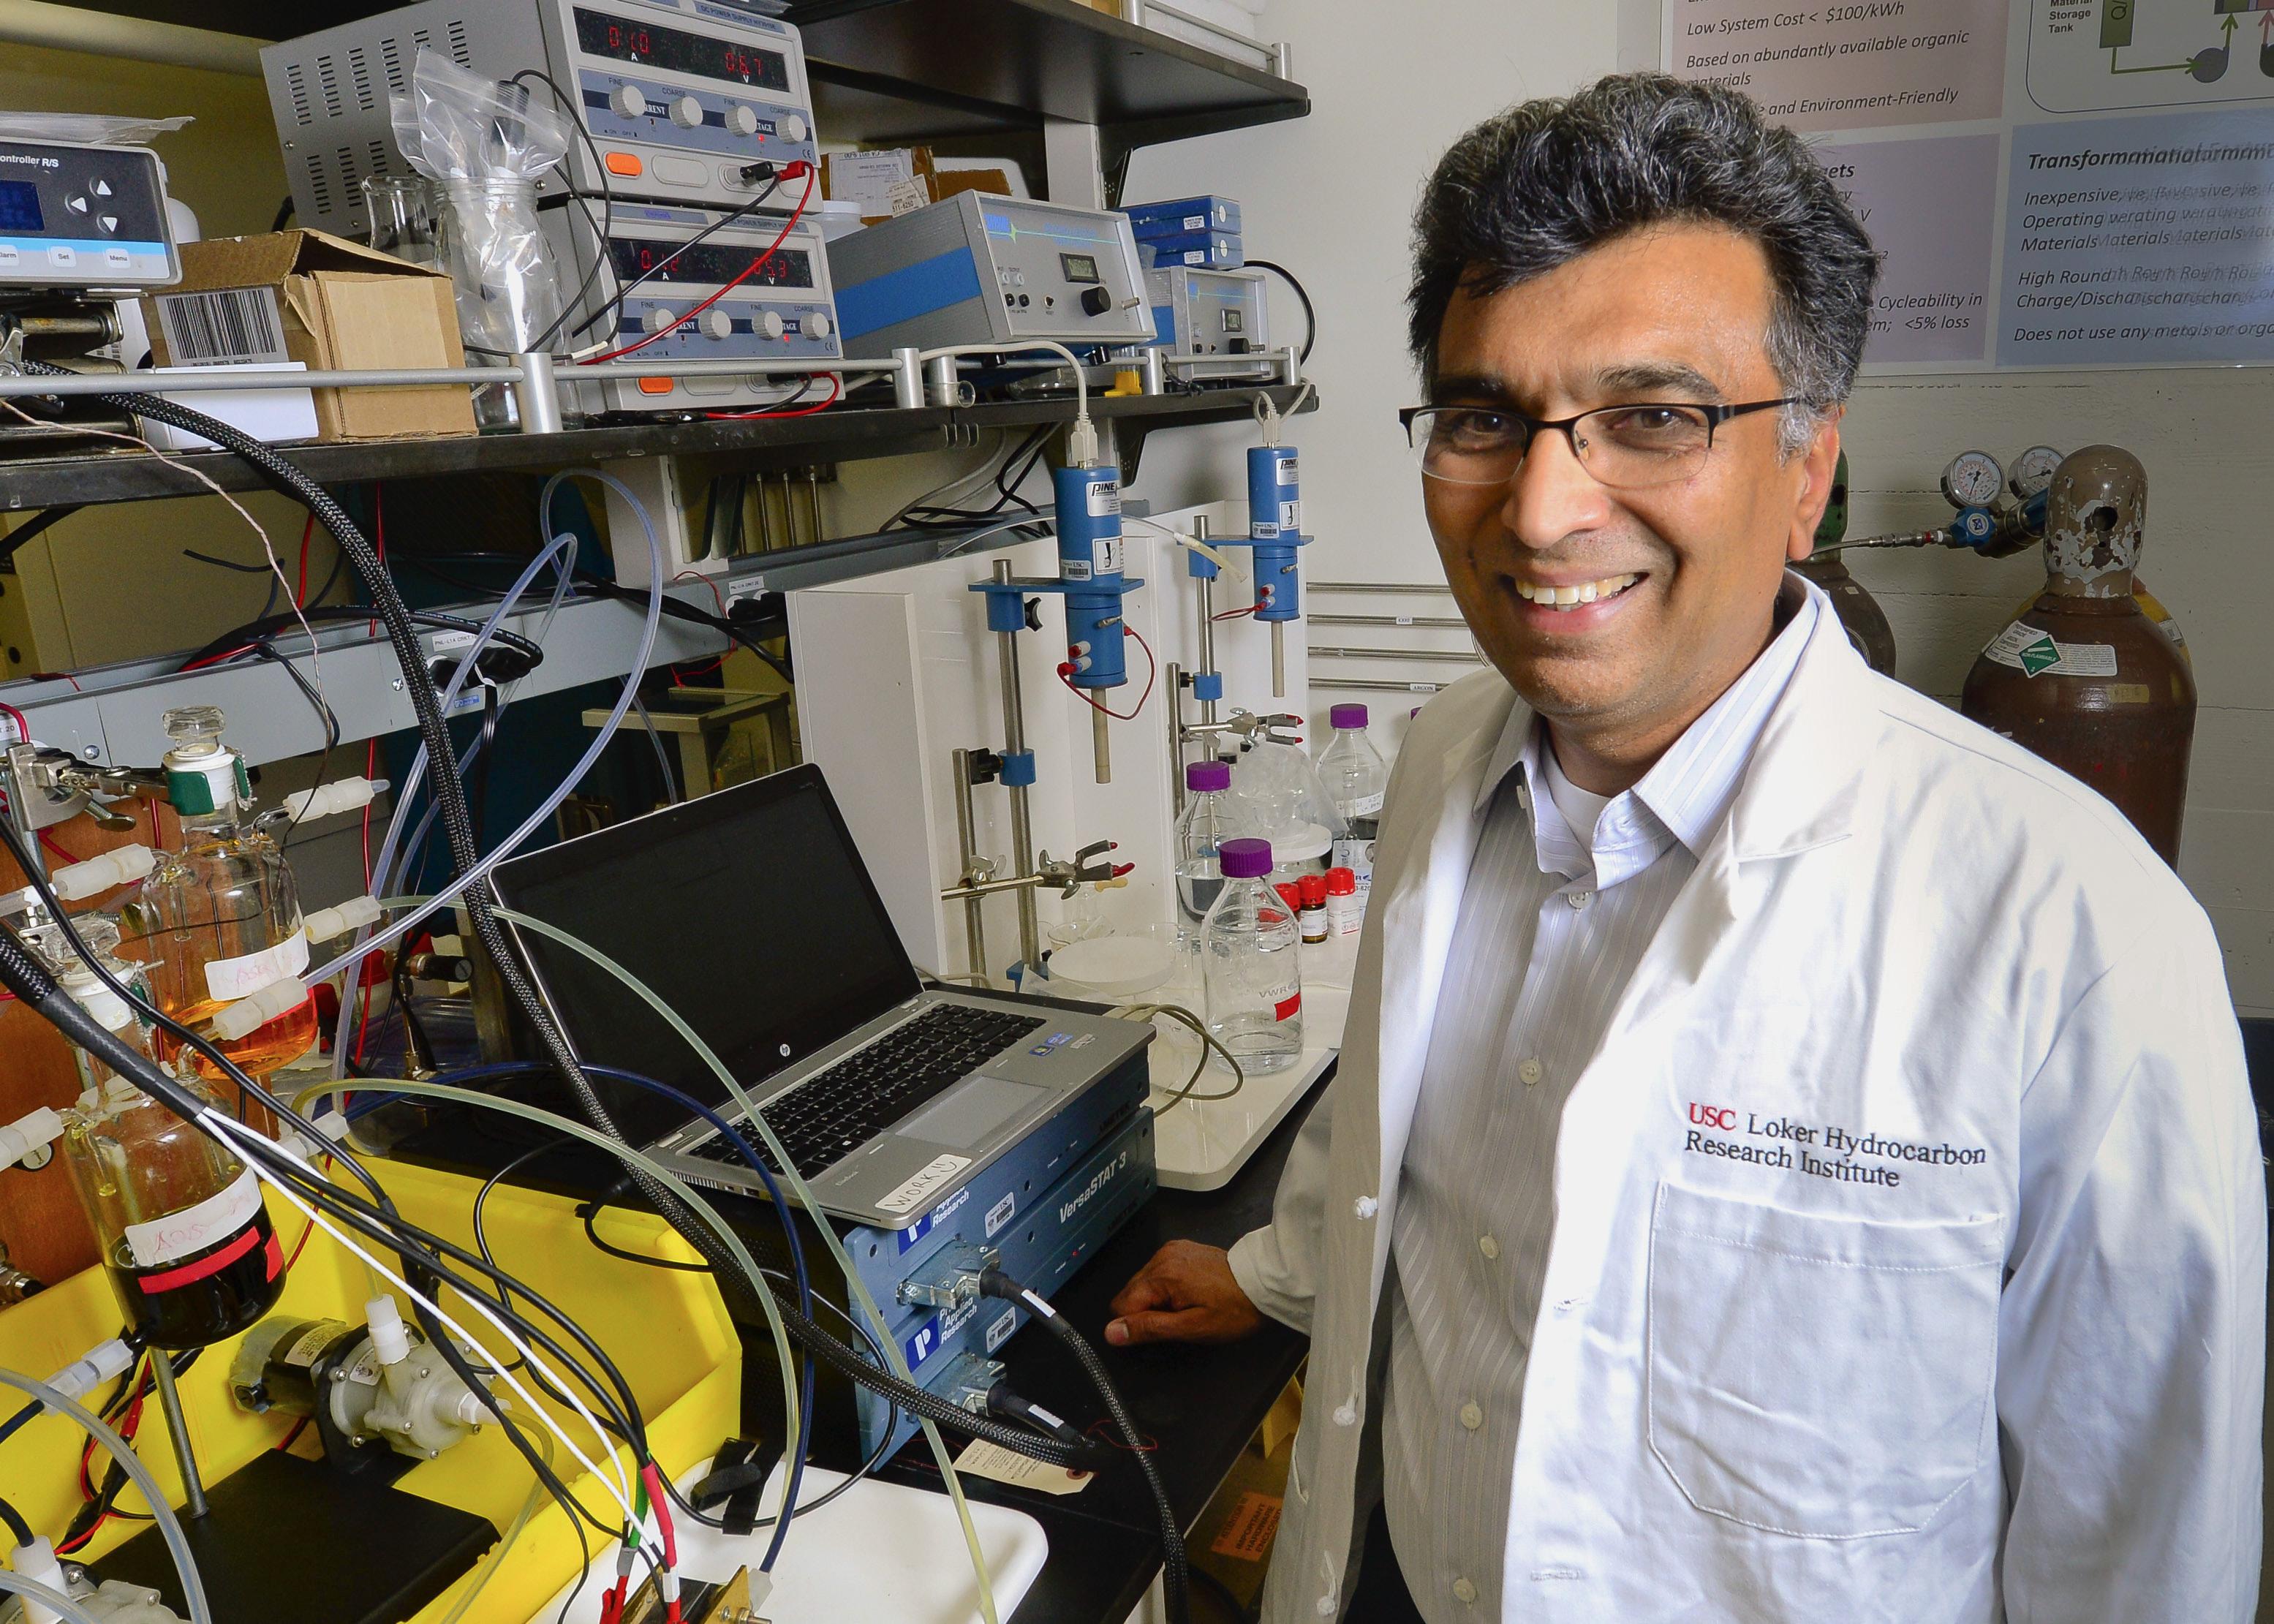 USC professor Sri Narayan working on an organic flow battery. Image courtesy of USC Photo / Gus Ruelas.